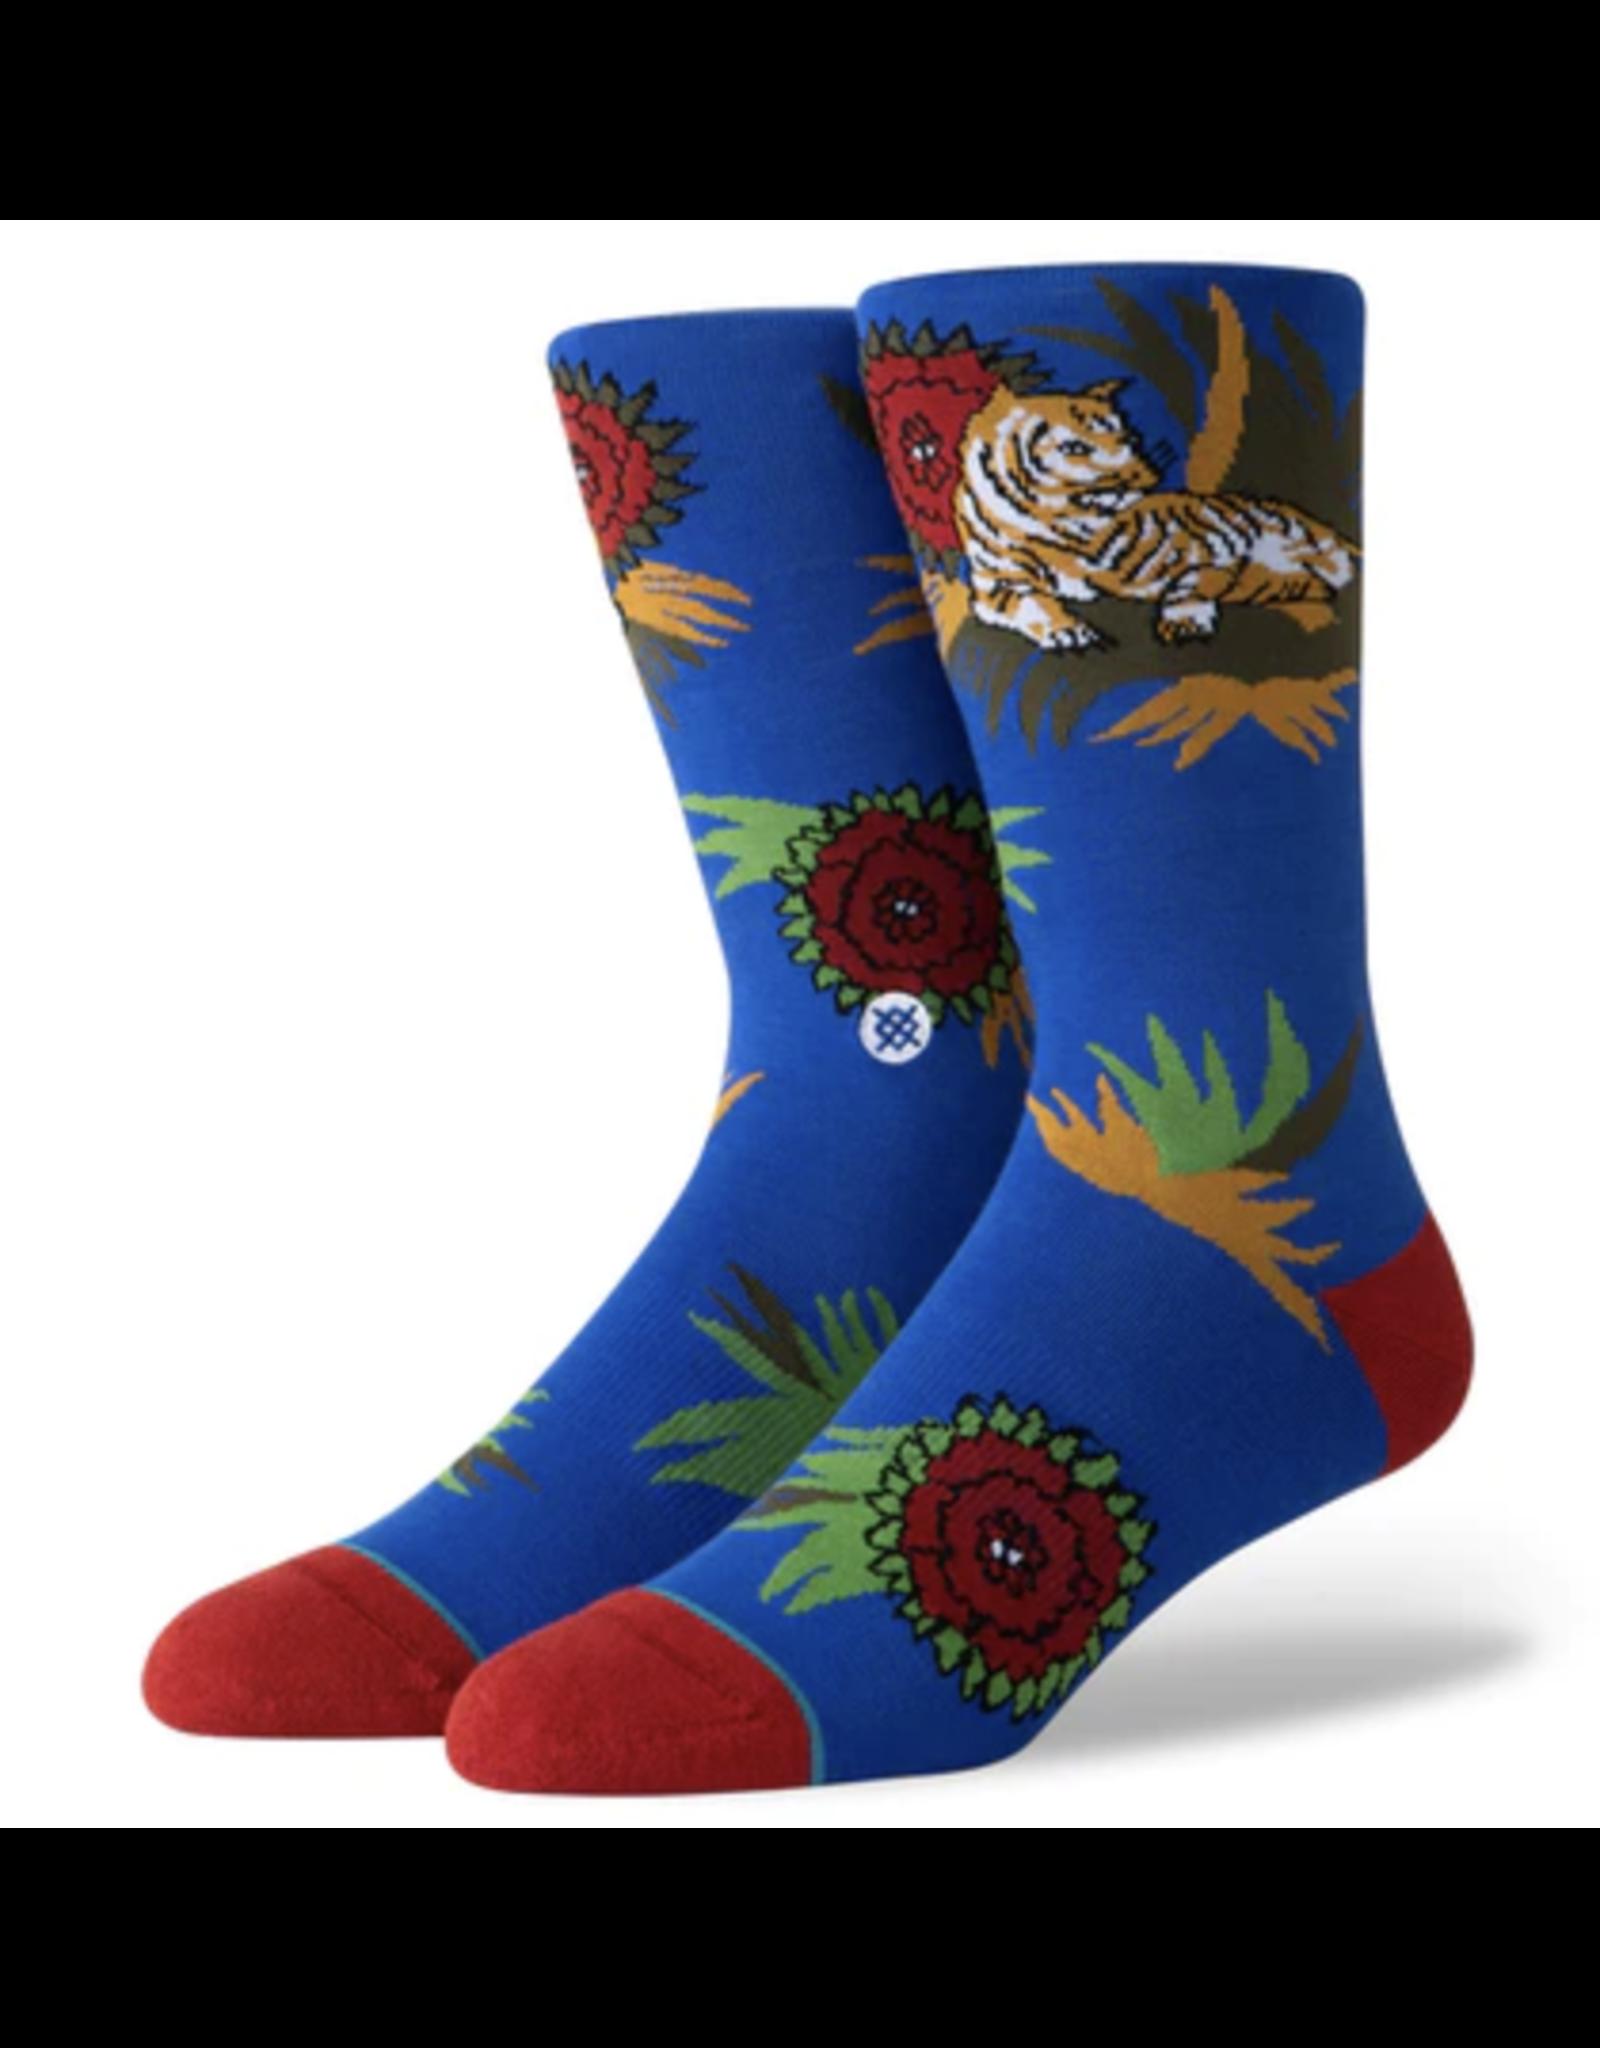 Stance Posted Socks - Royal Blue